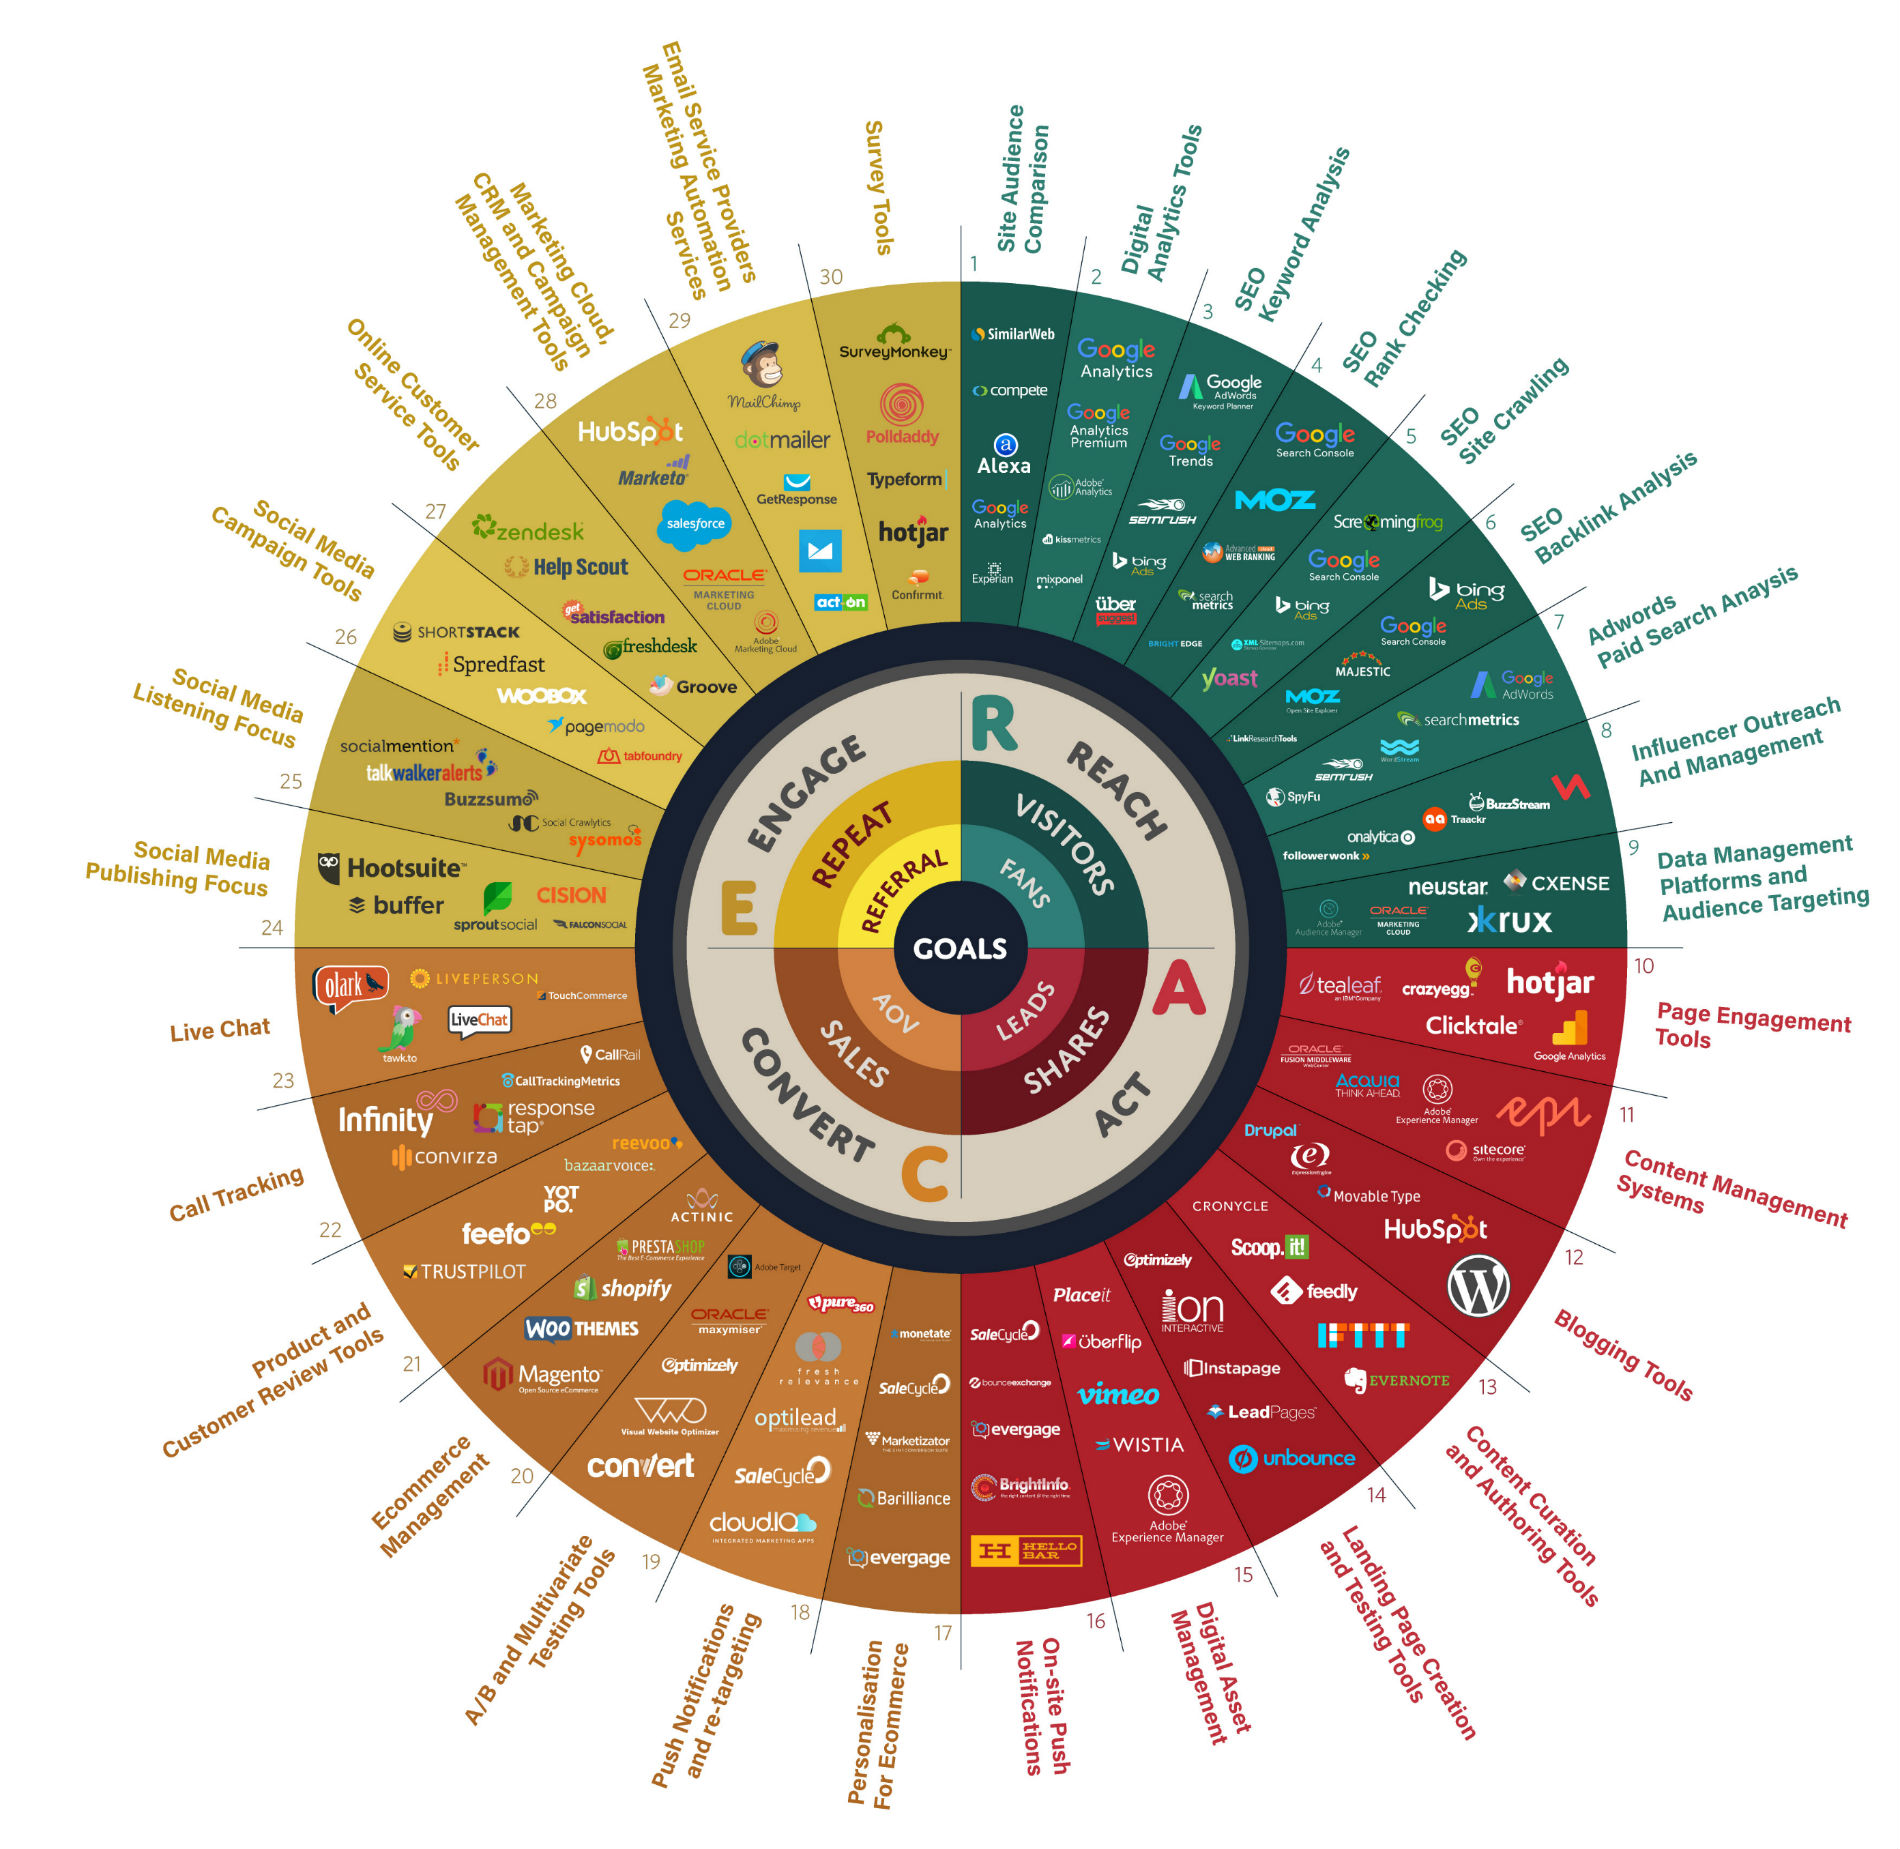 Digital Marketing Tools 2017